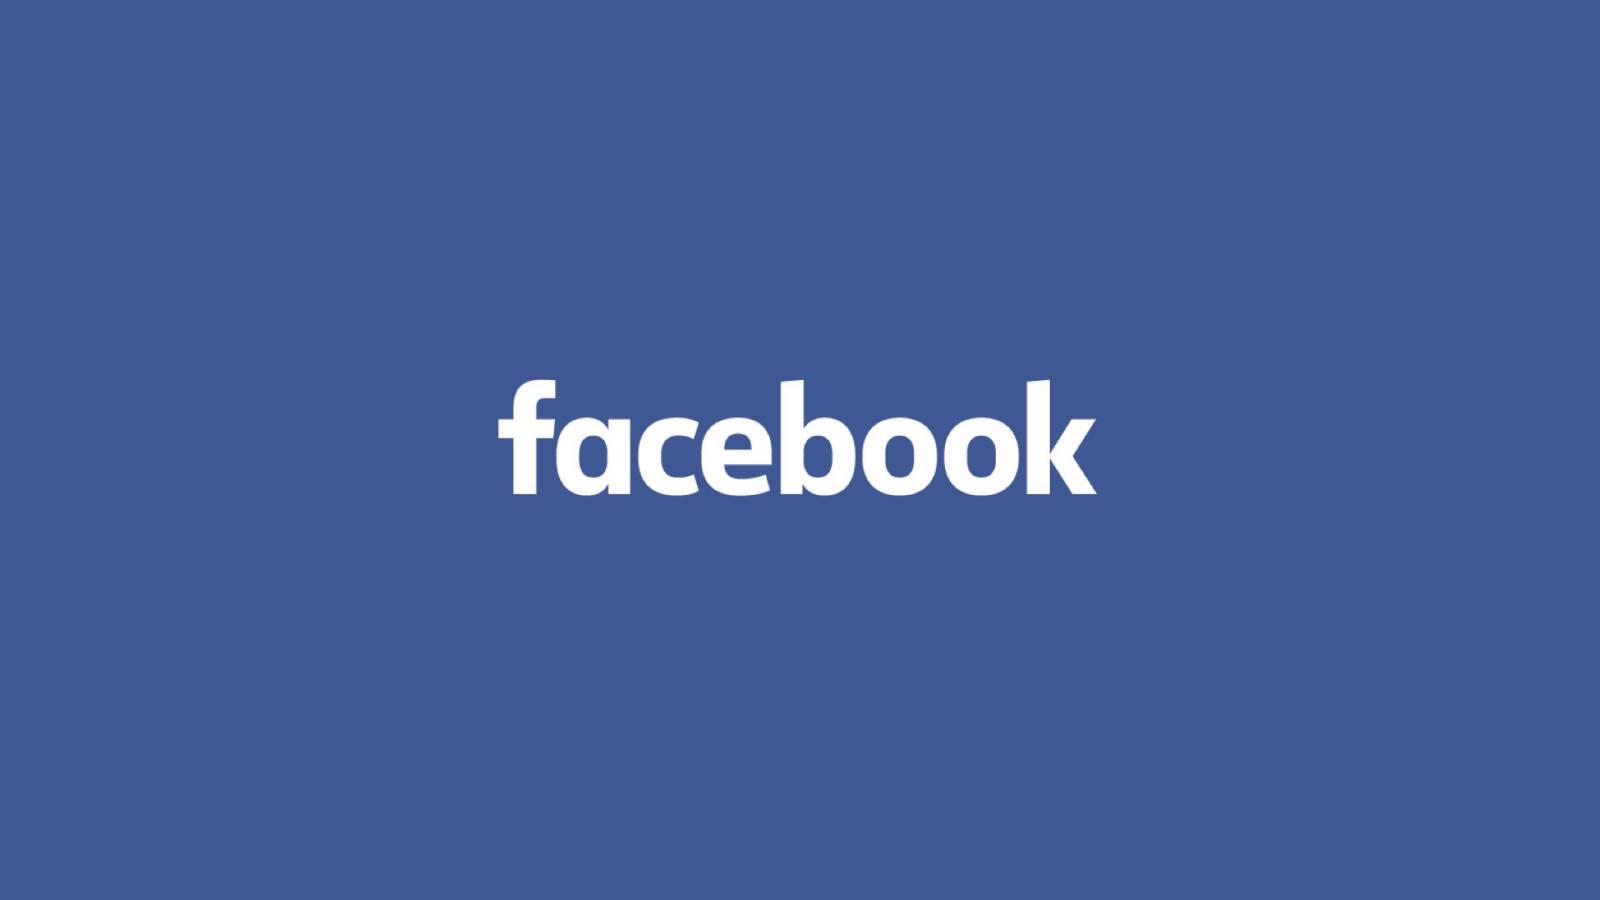 Facebook Update Lansat Acum Telefoane Tablete